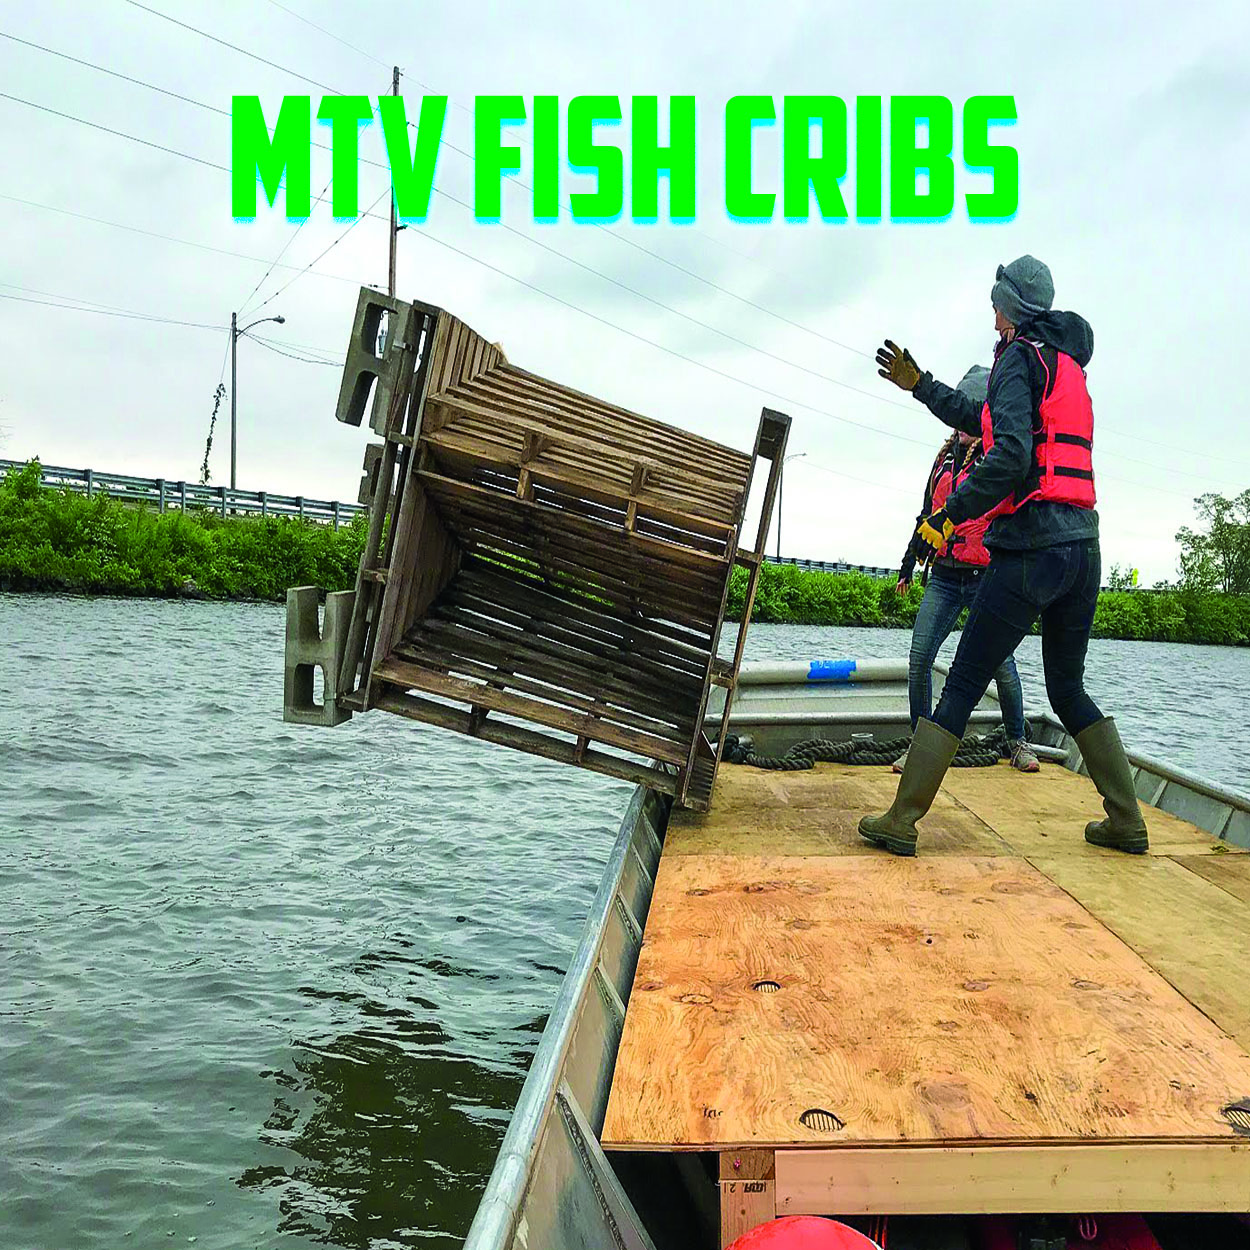 MTV Fish Cribs